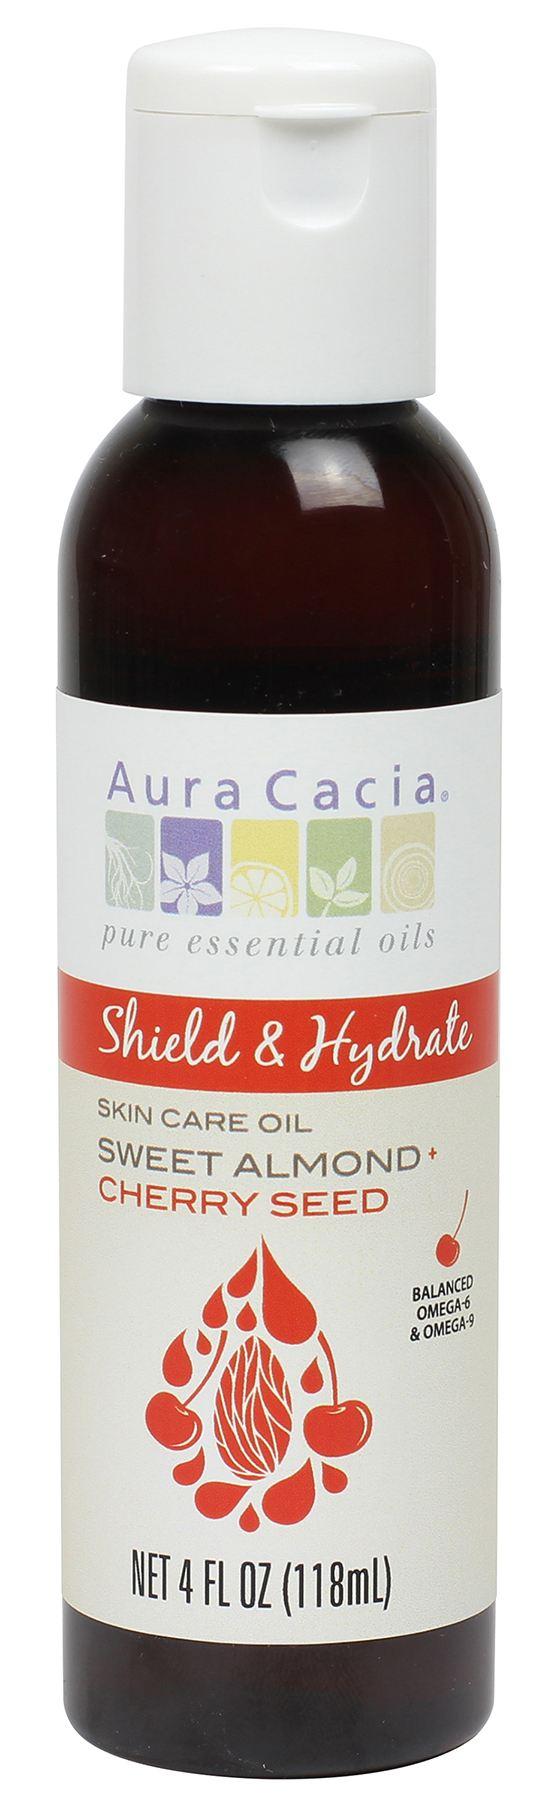 Aura Cacia Fruit Seed Body Oil